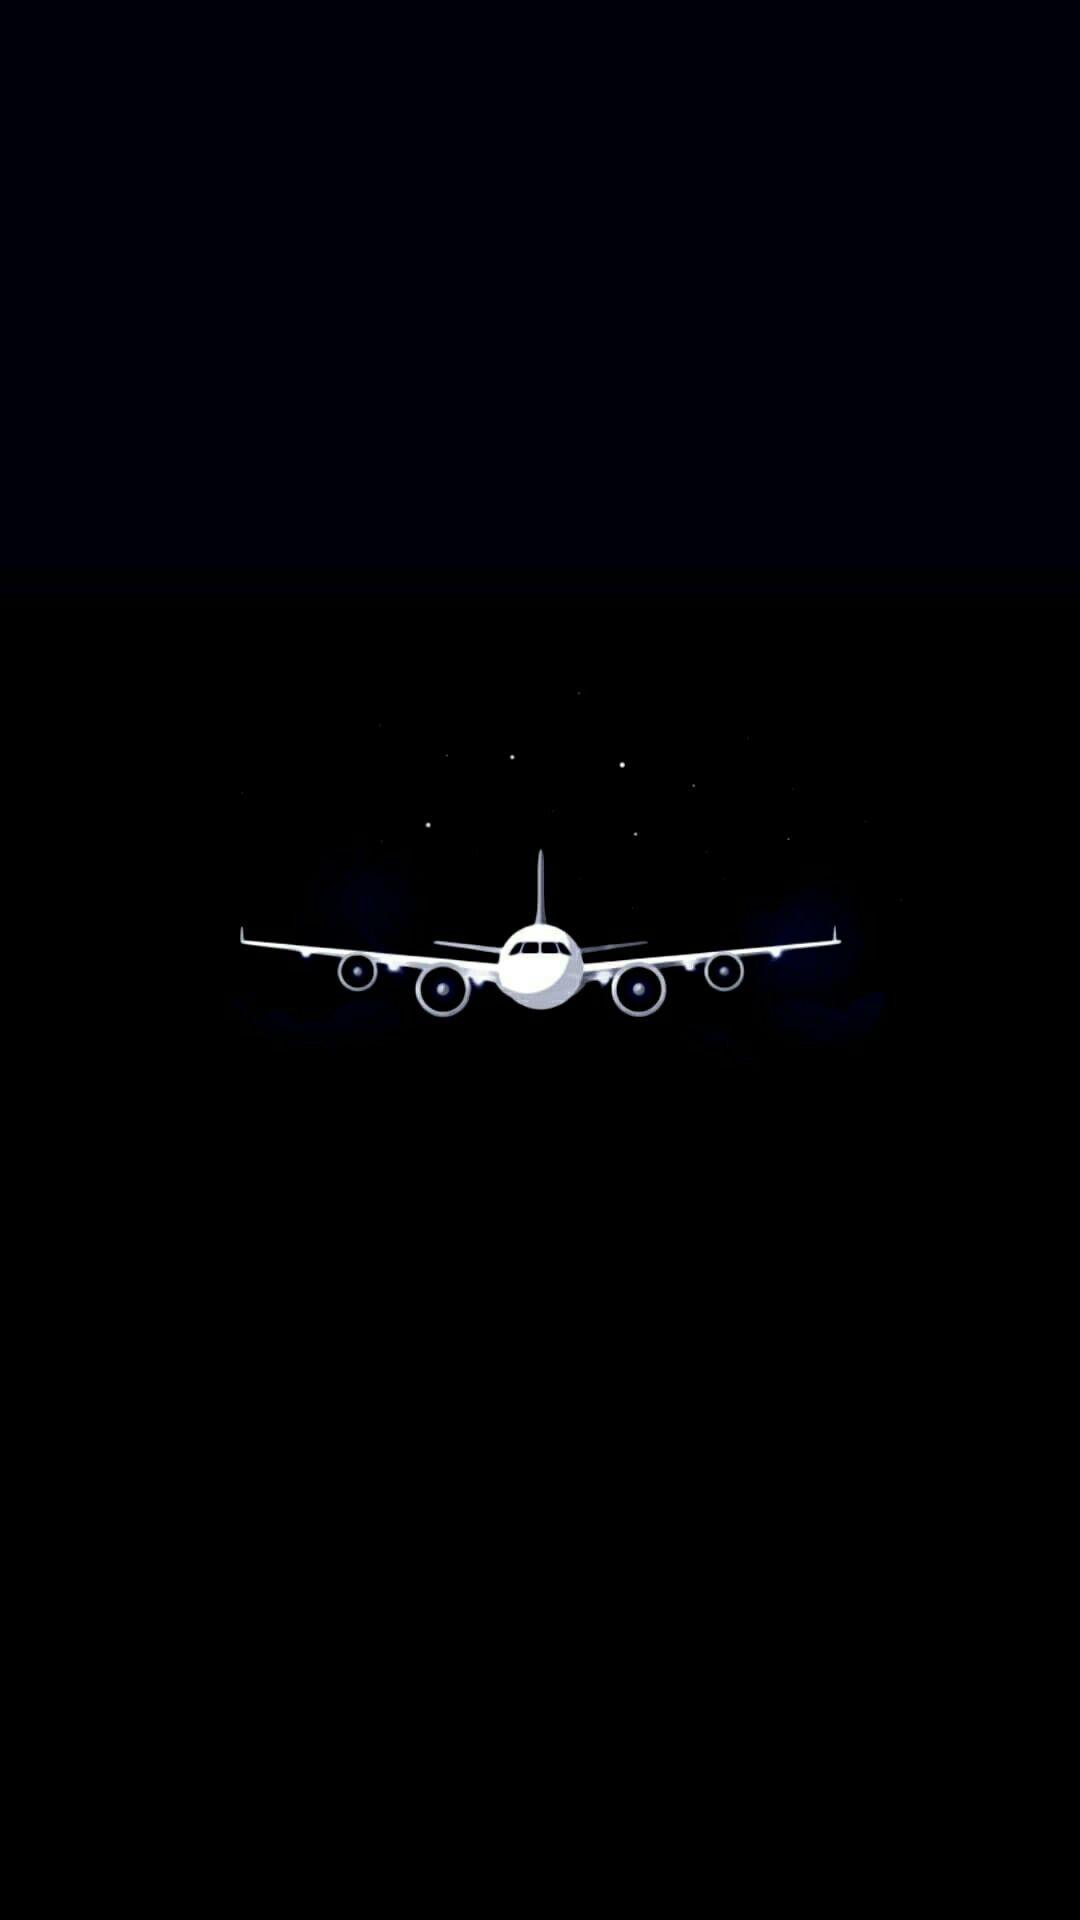 ️ ️ ️ OMG ️ ️ ️ airplane simple pinterest